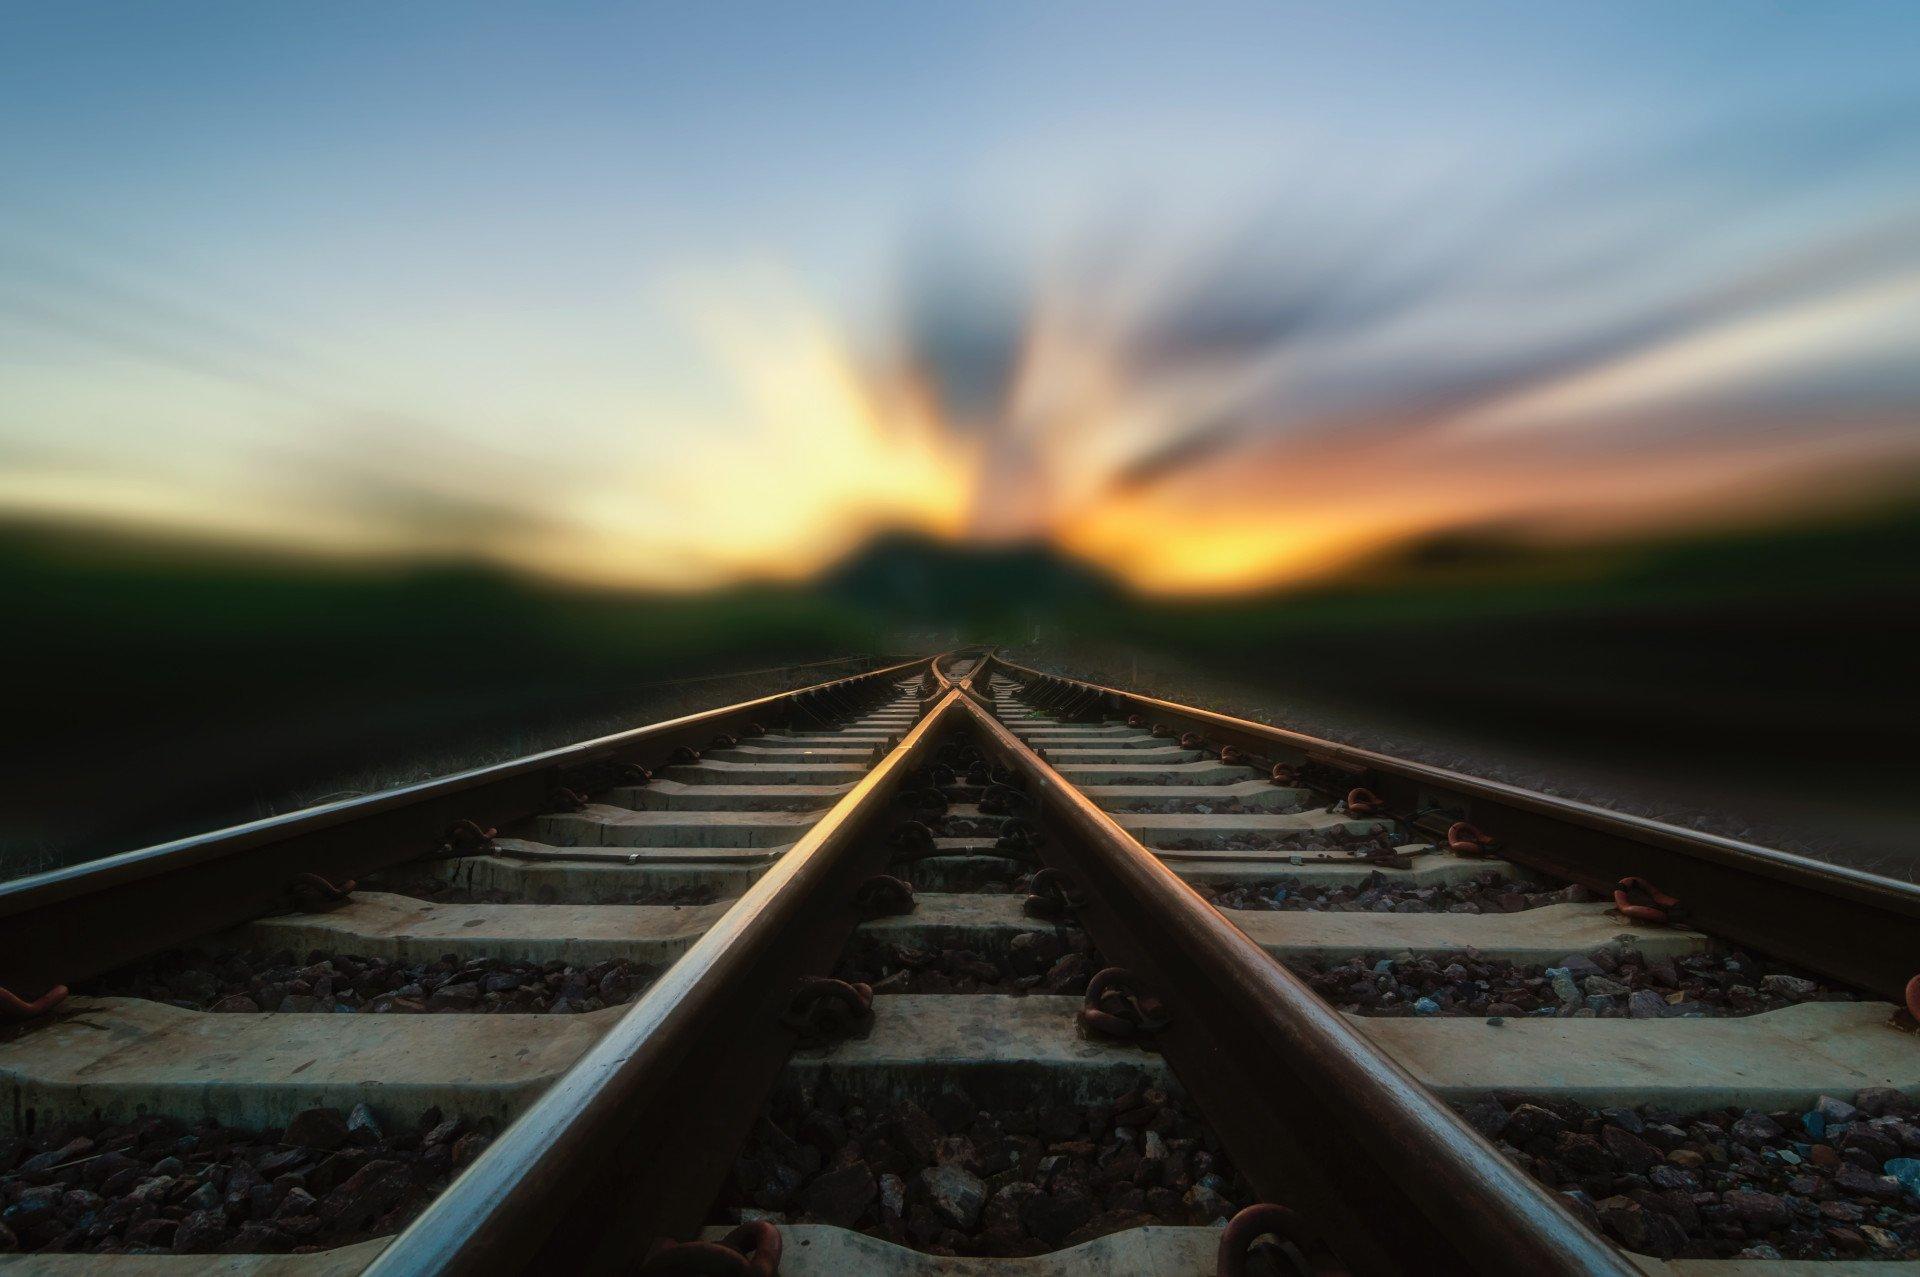 rail-lines-merge-converge-sunset-blur